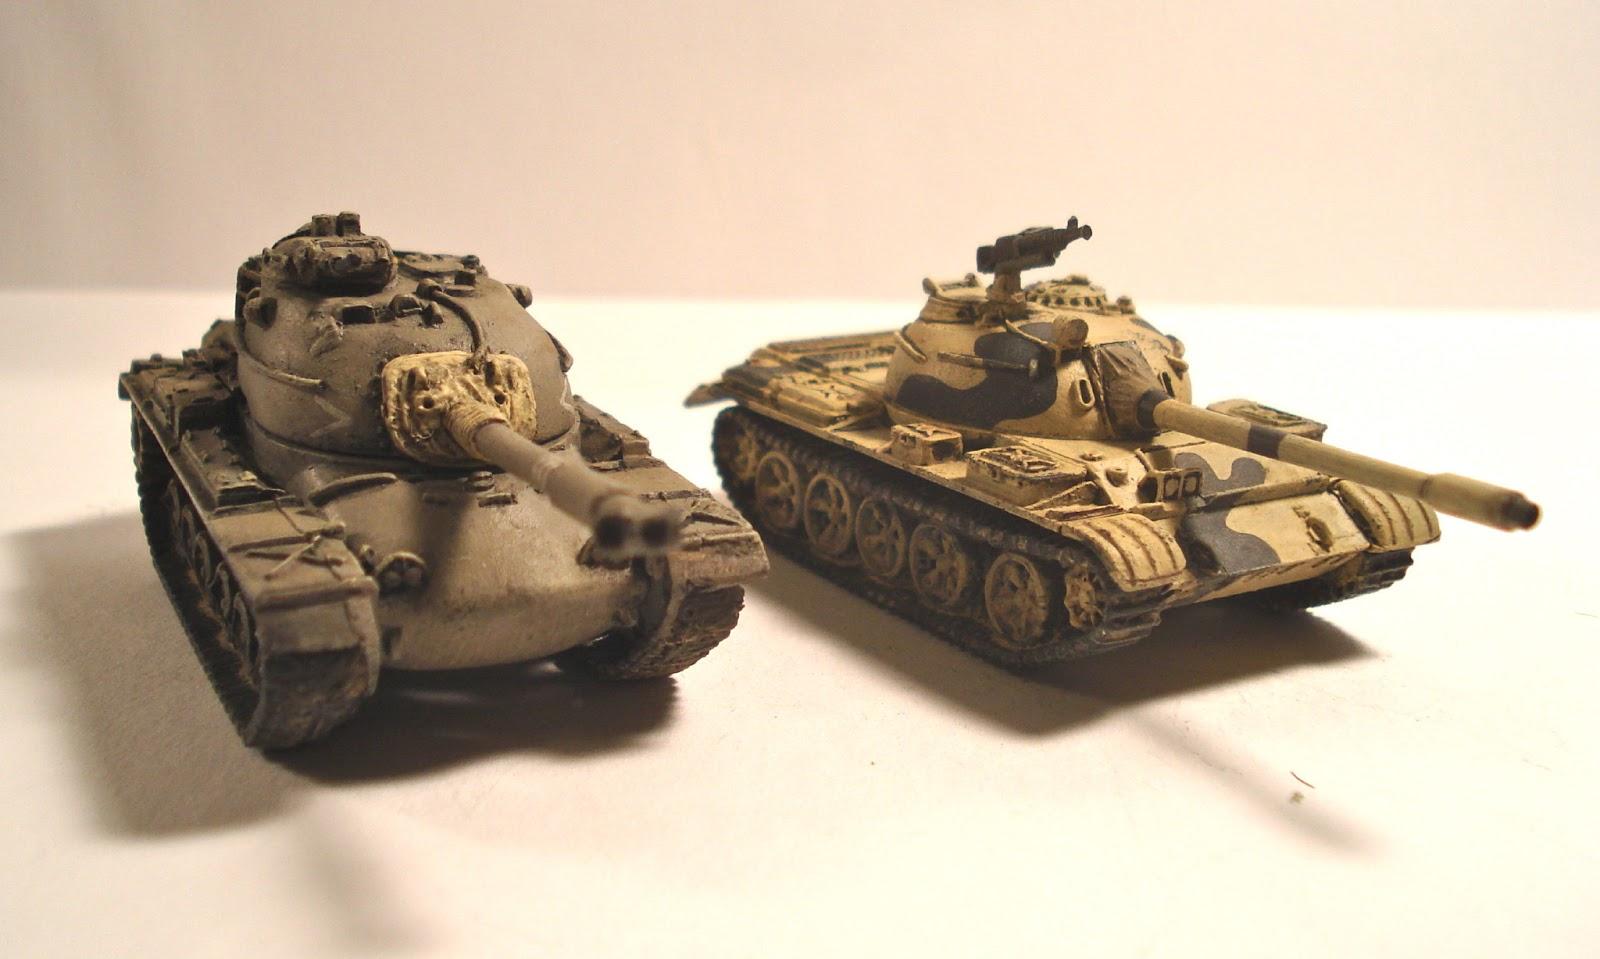 Broke Low Eygptian T 55 Tanks Fow